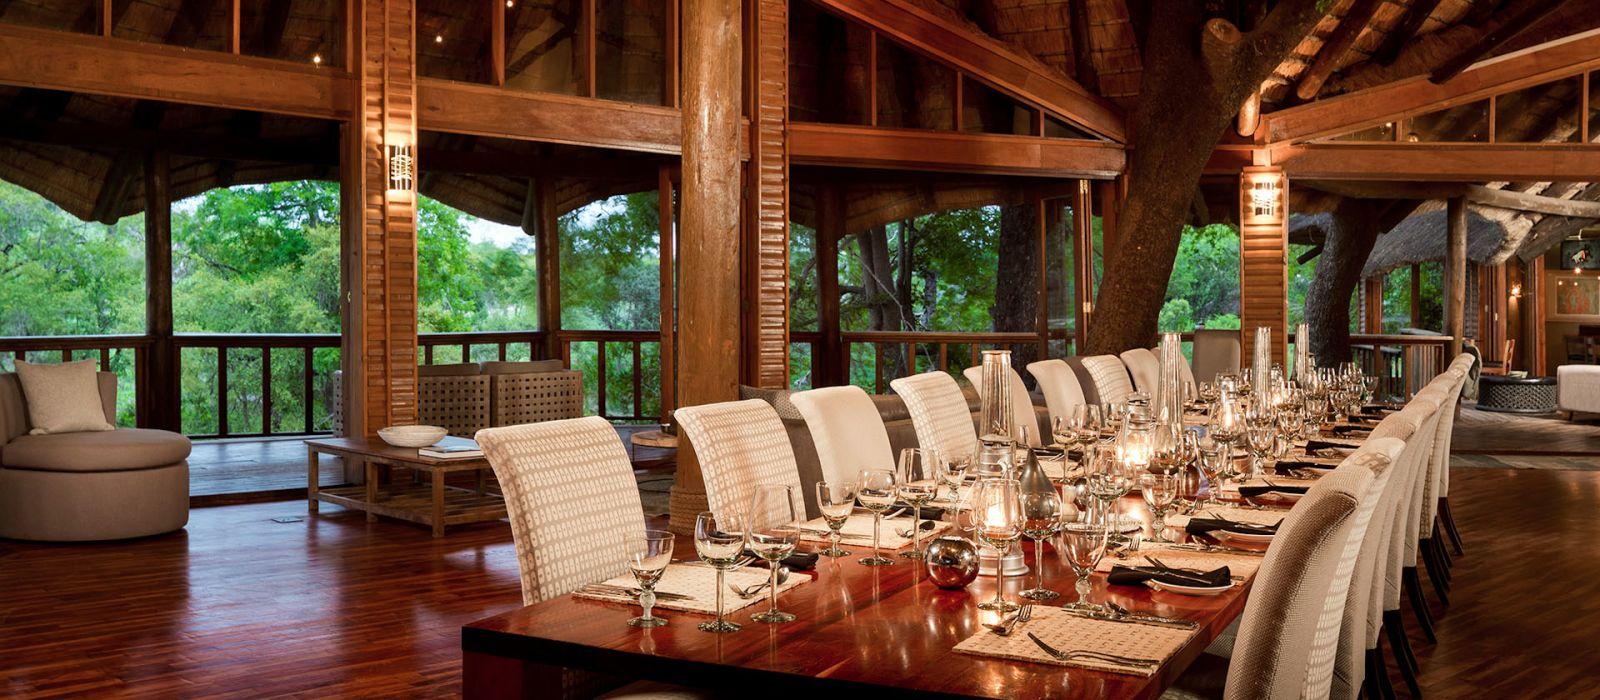 Hotel Ulusaba Safari Lodge South Africa